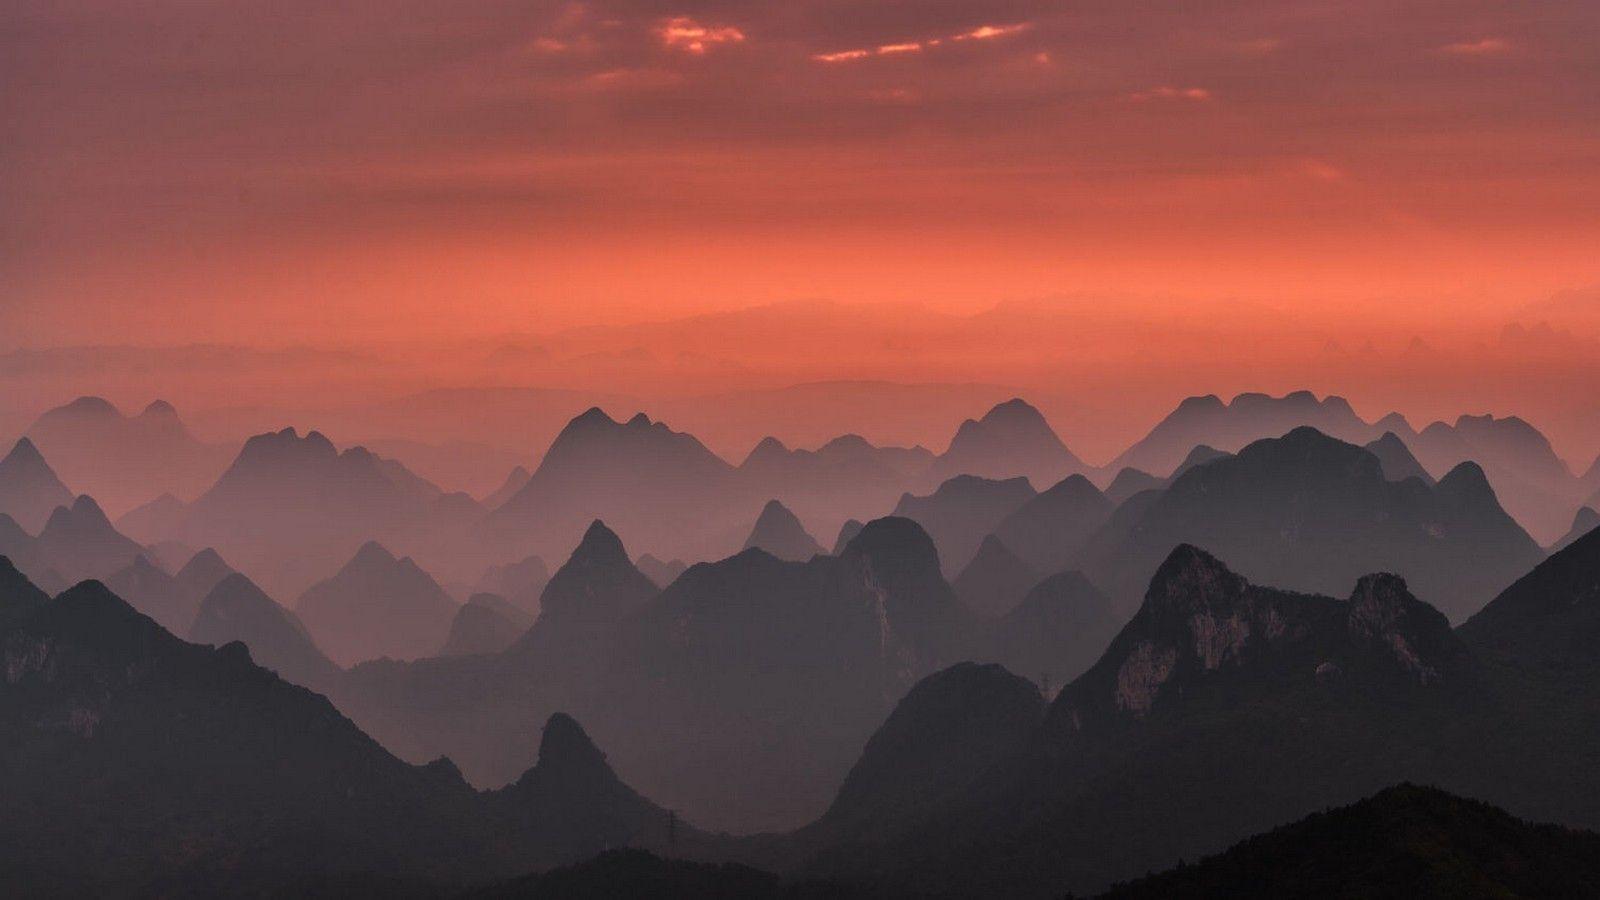 Mountain Sunrise Scenery Landscape Nature Wallpapers Nature Landscape Sunrise Mountains Landscape Guilin Landscape Photography